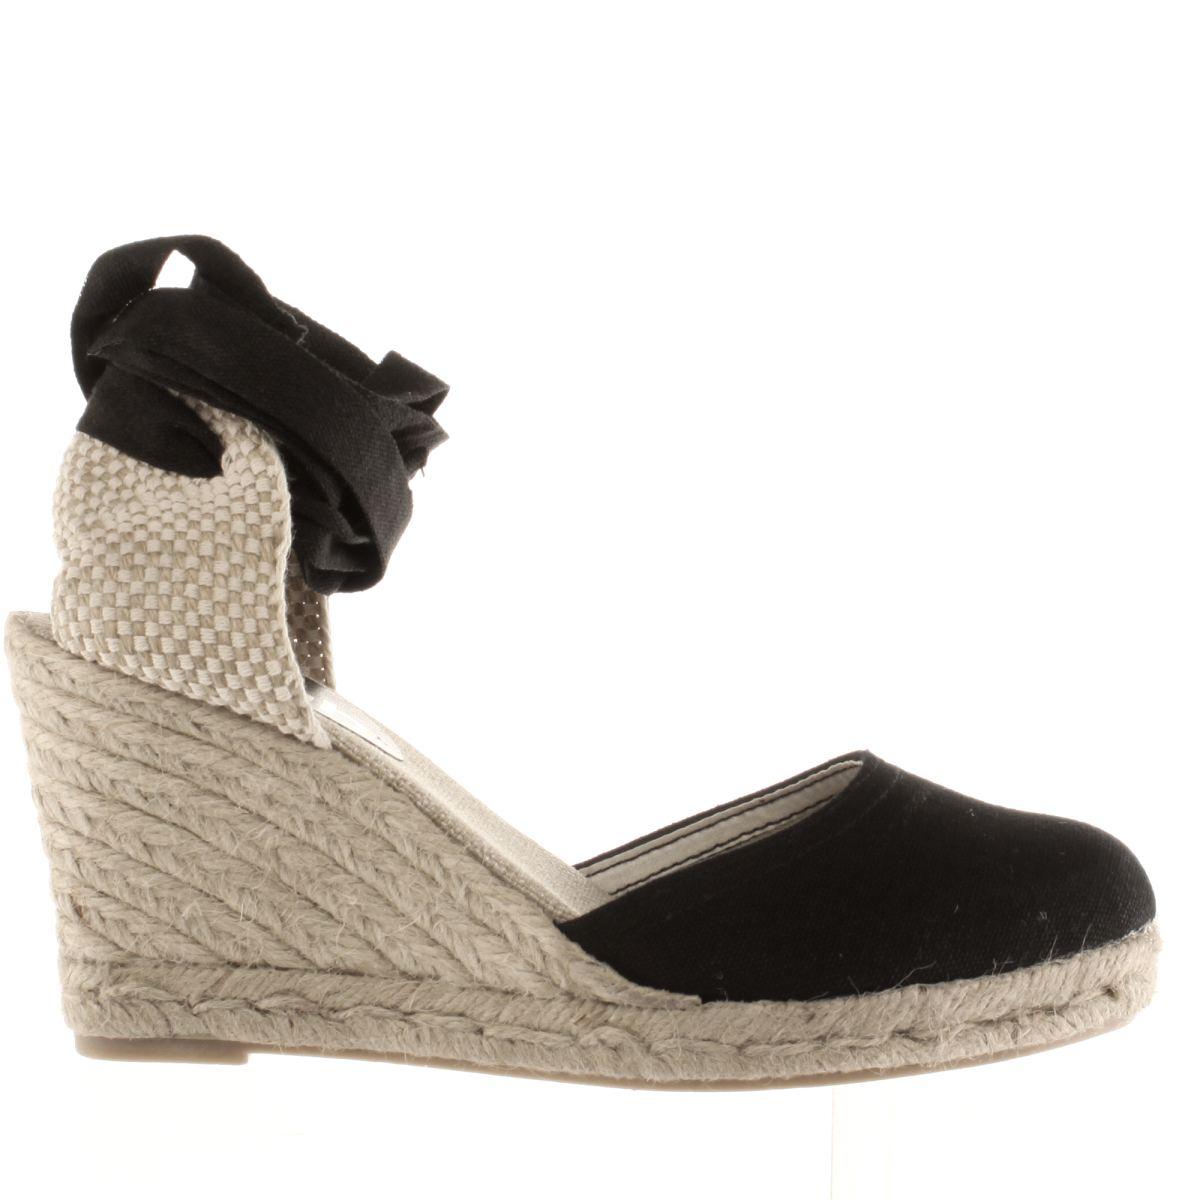 schuh black parade sandals